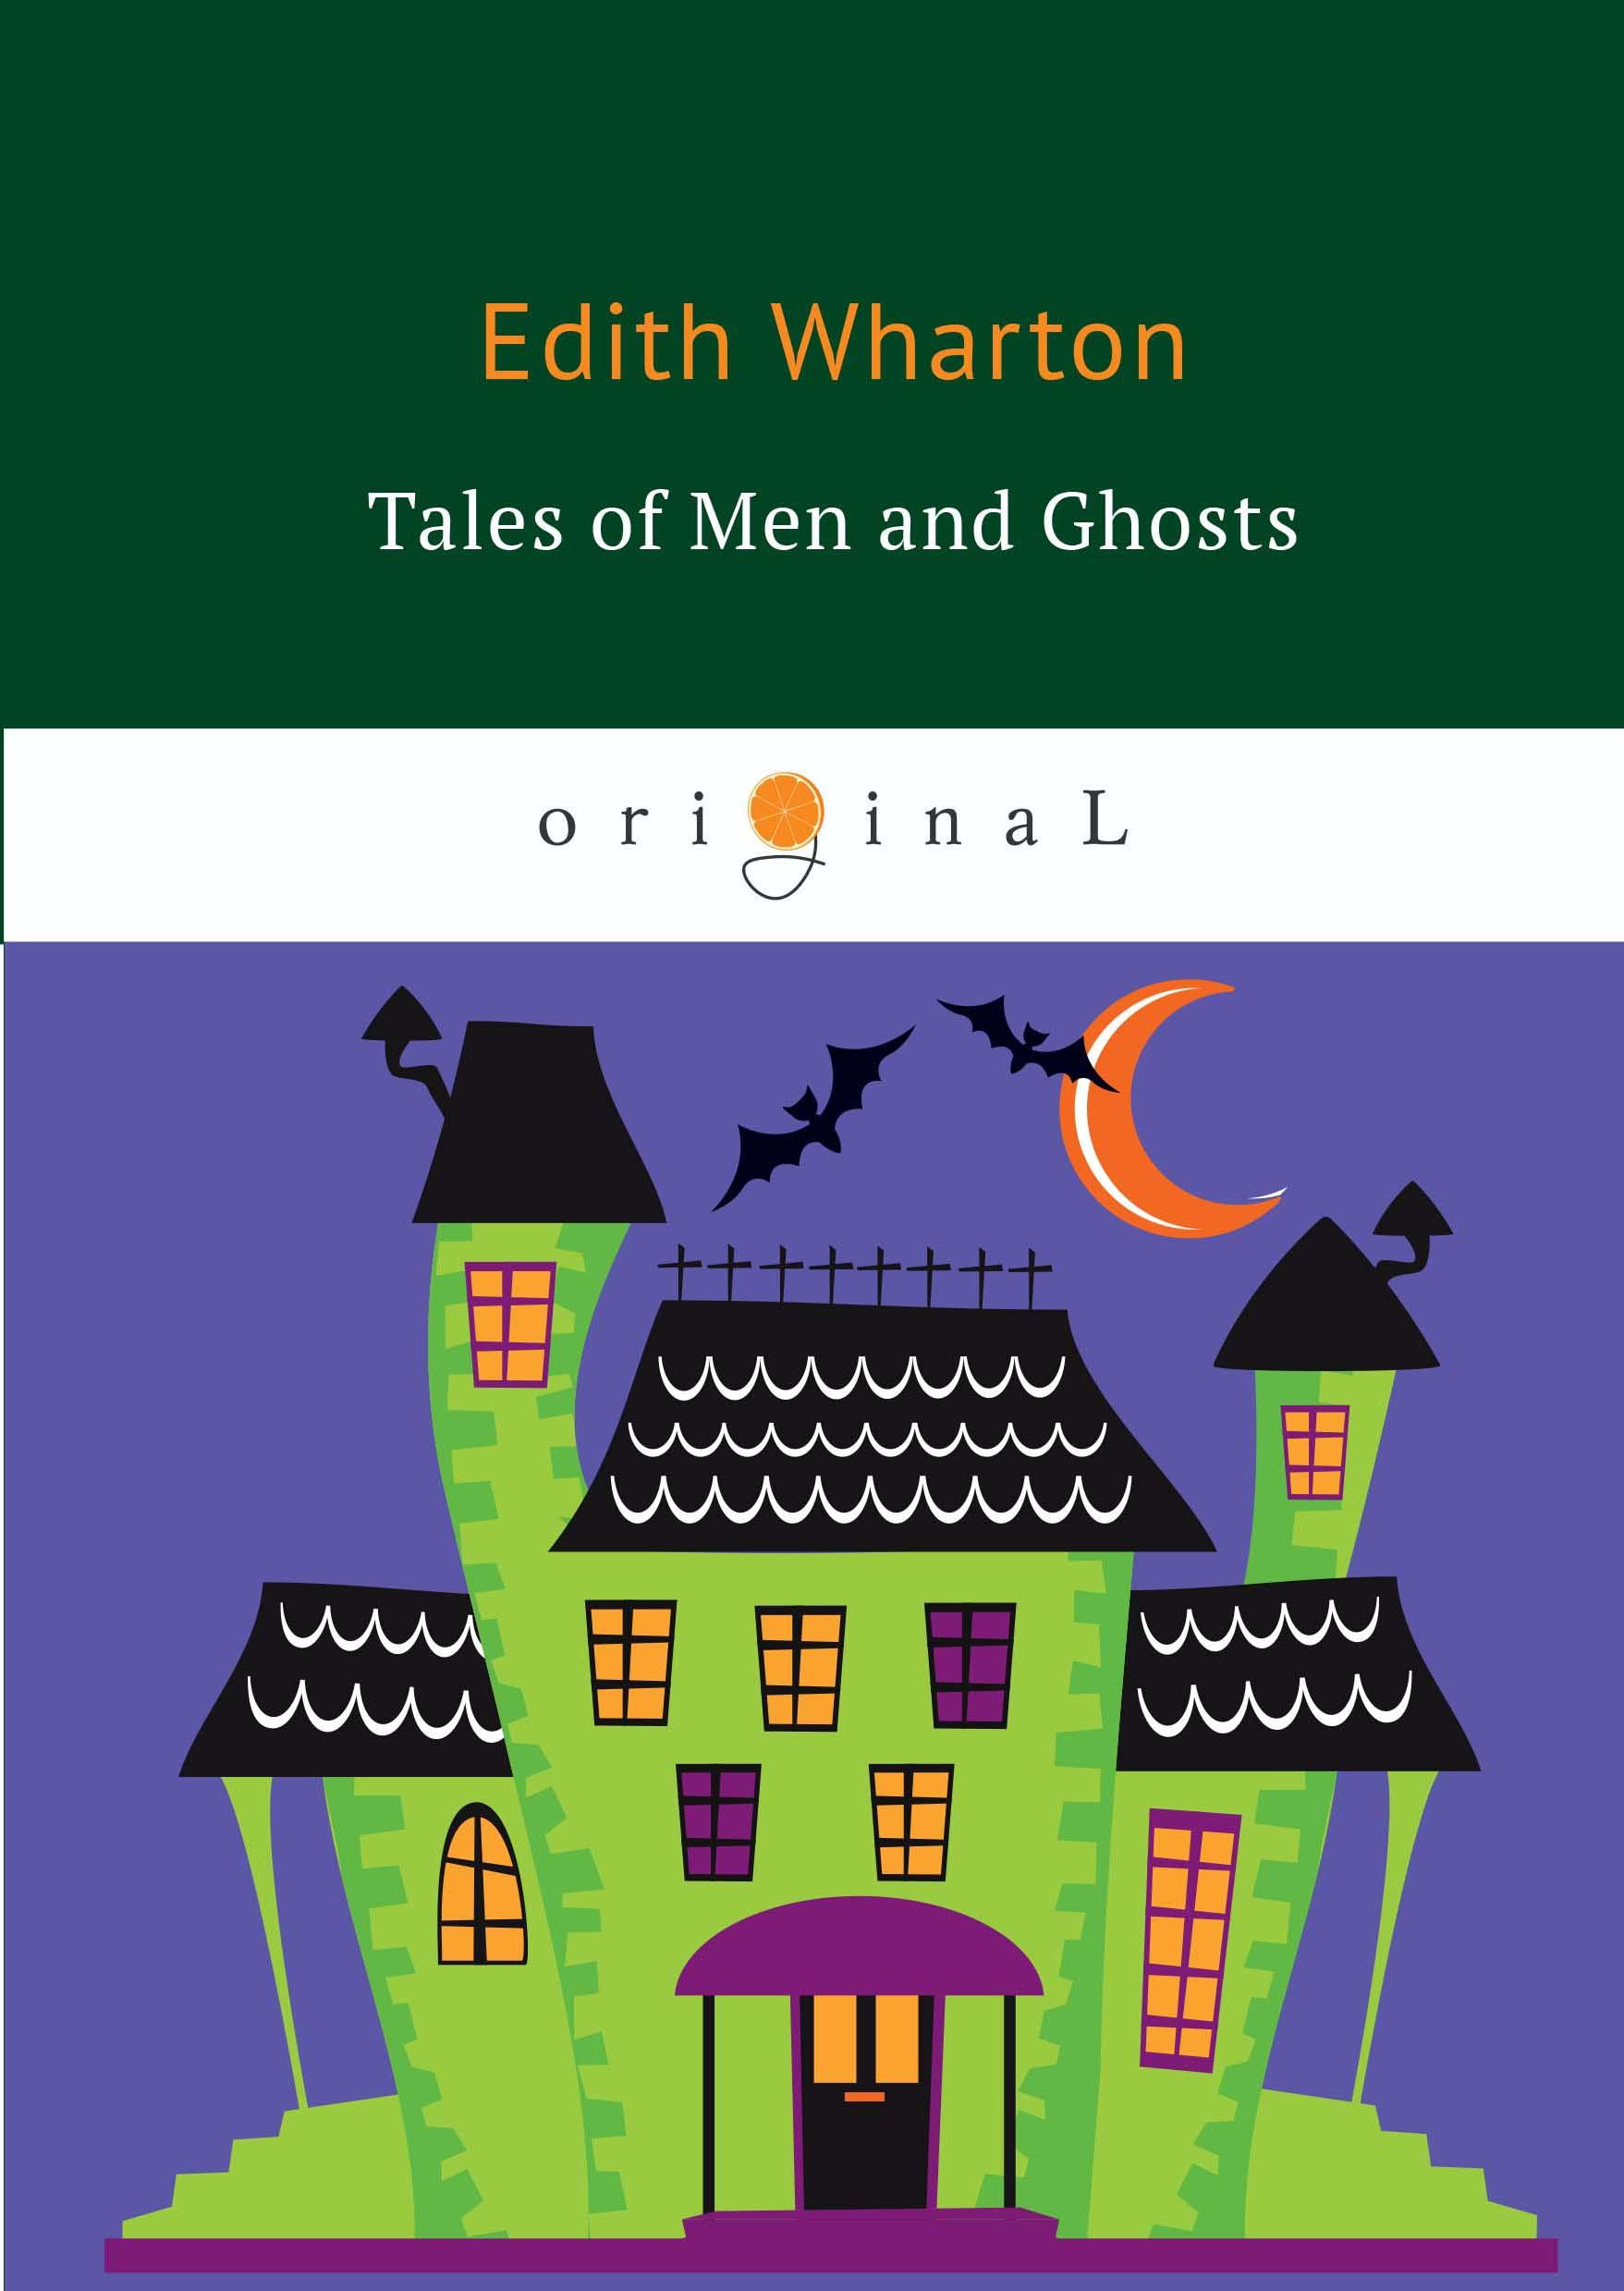 лучшая цена E. Wharton Tales of Men and Ghosts